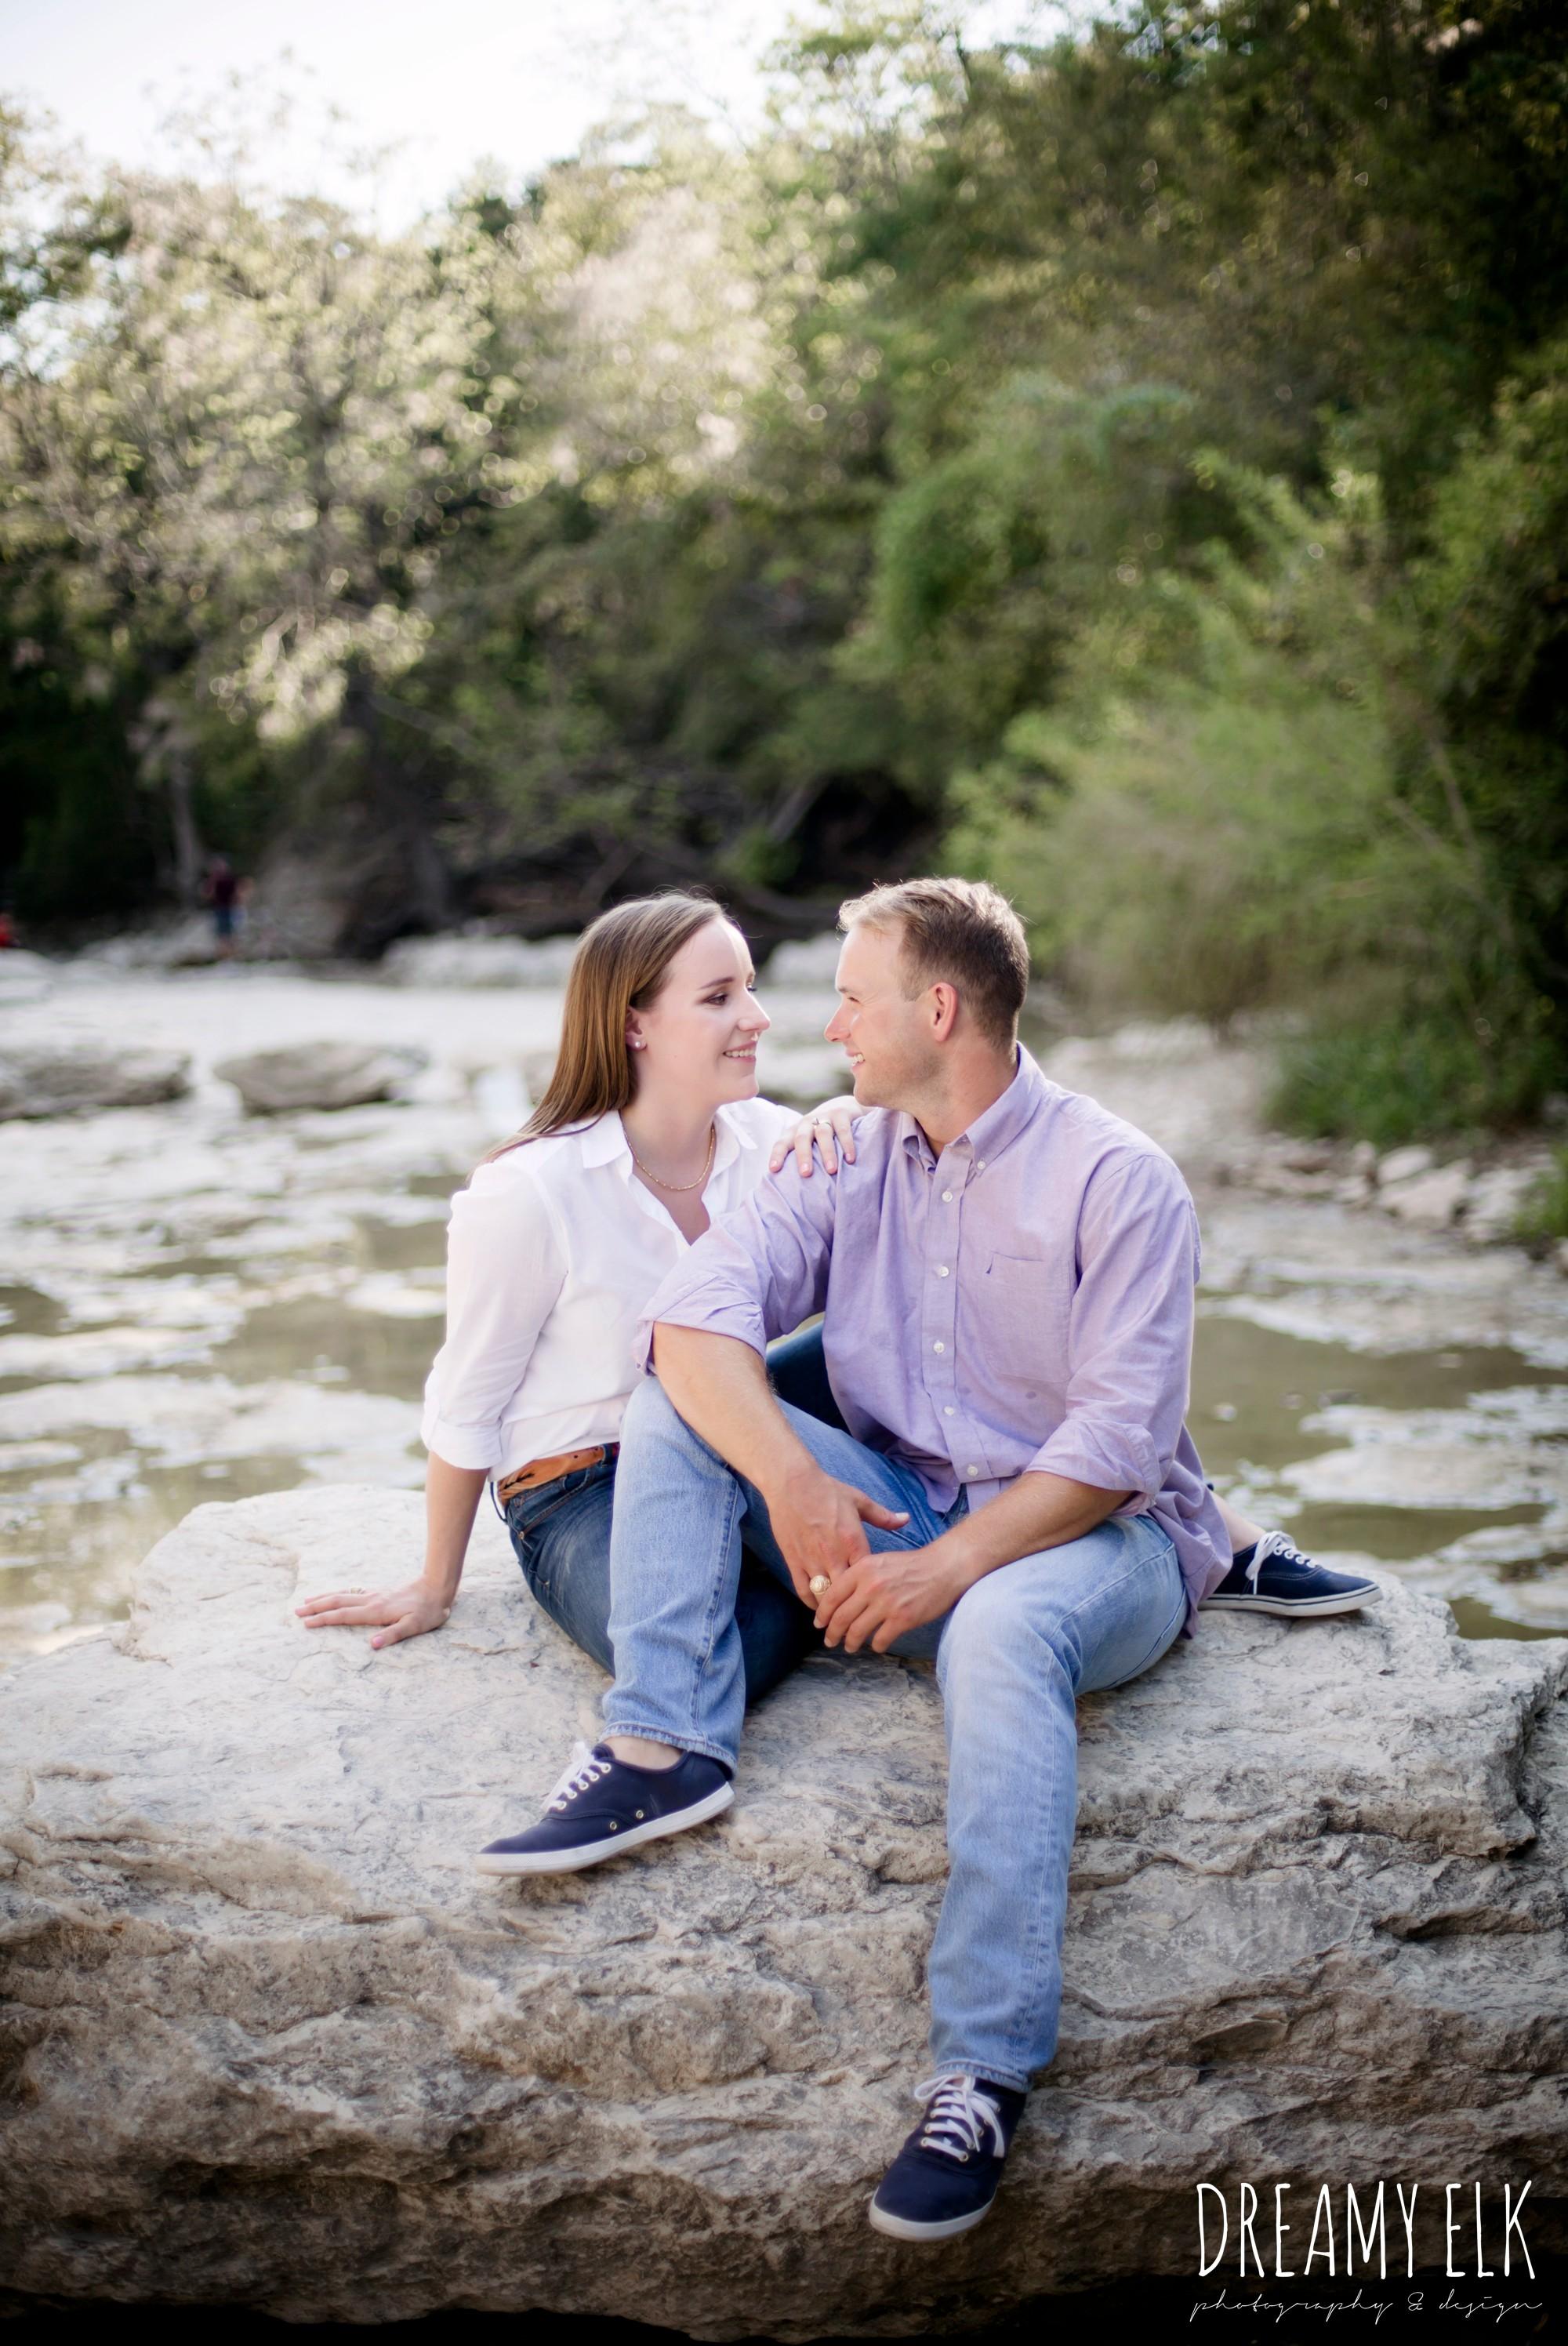 walnut creek park, outdoor september engagement photo, casual wardrobe, austin texas wedding photographer, austin texas parks {dreamy elk photography and design}